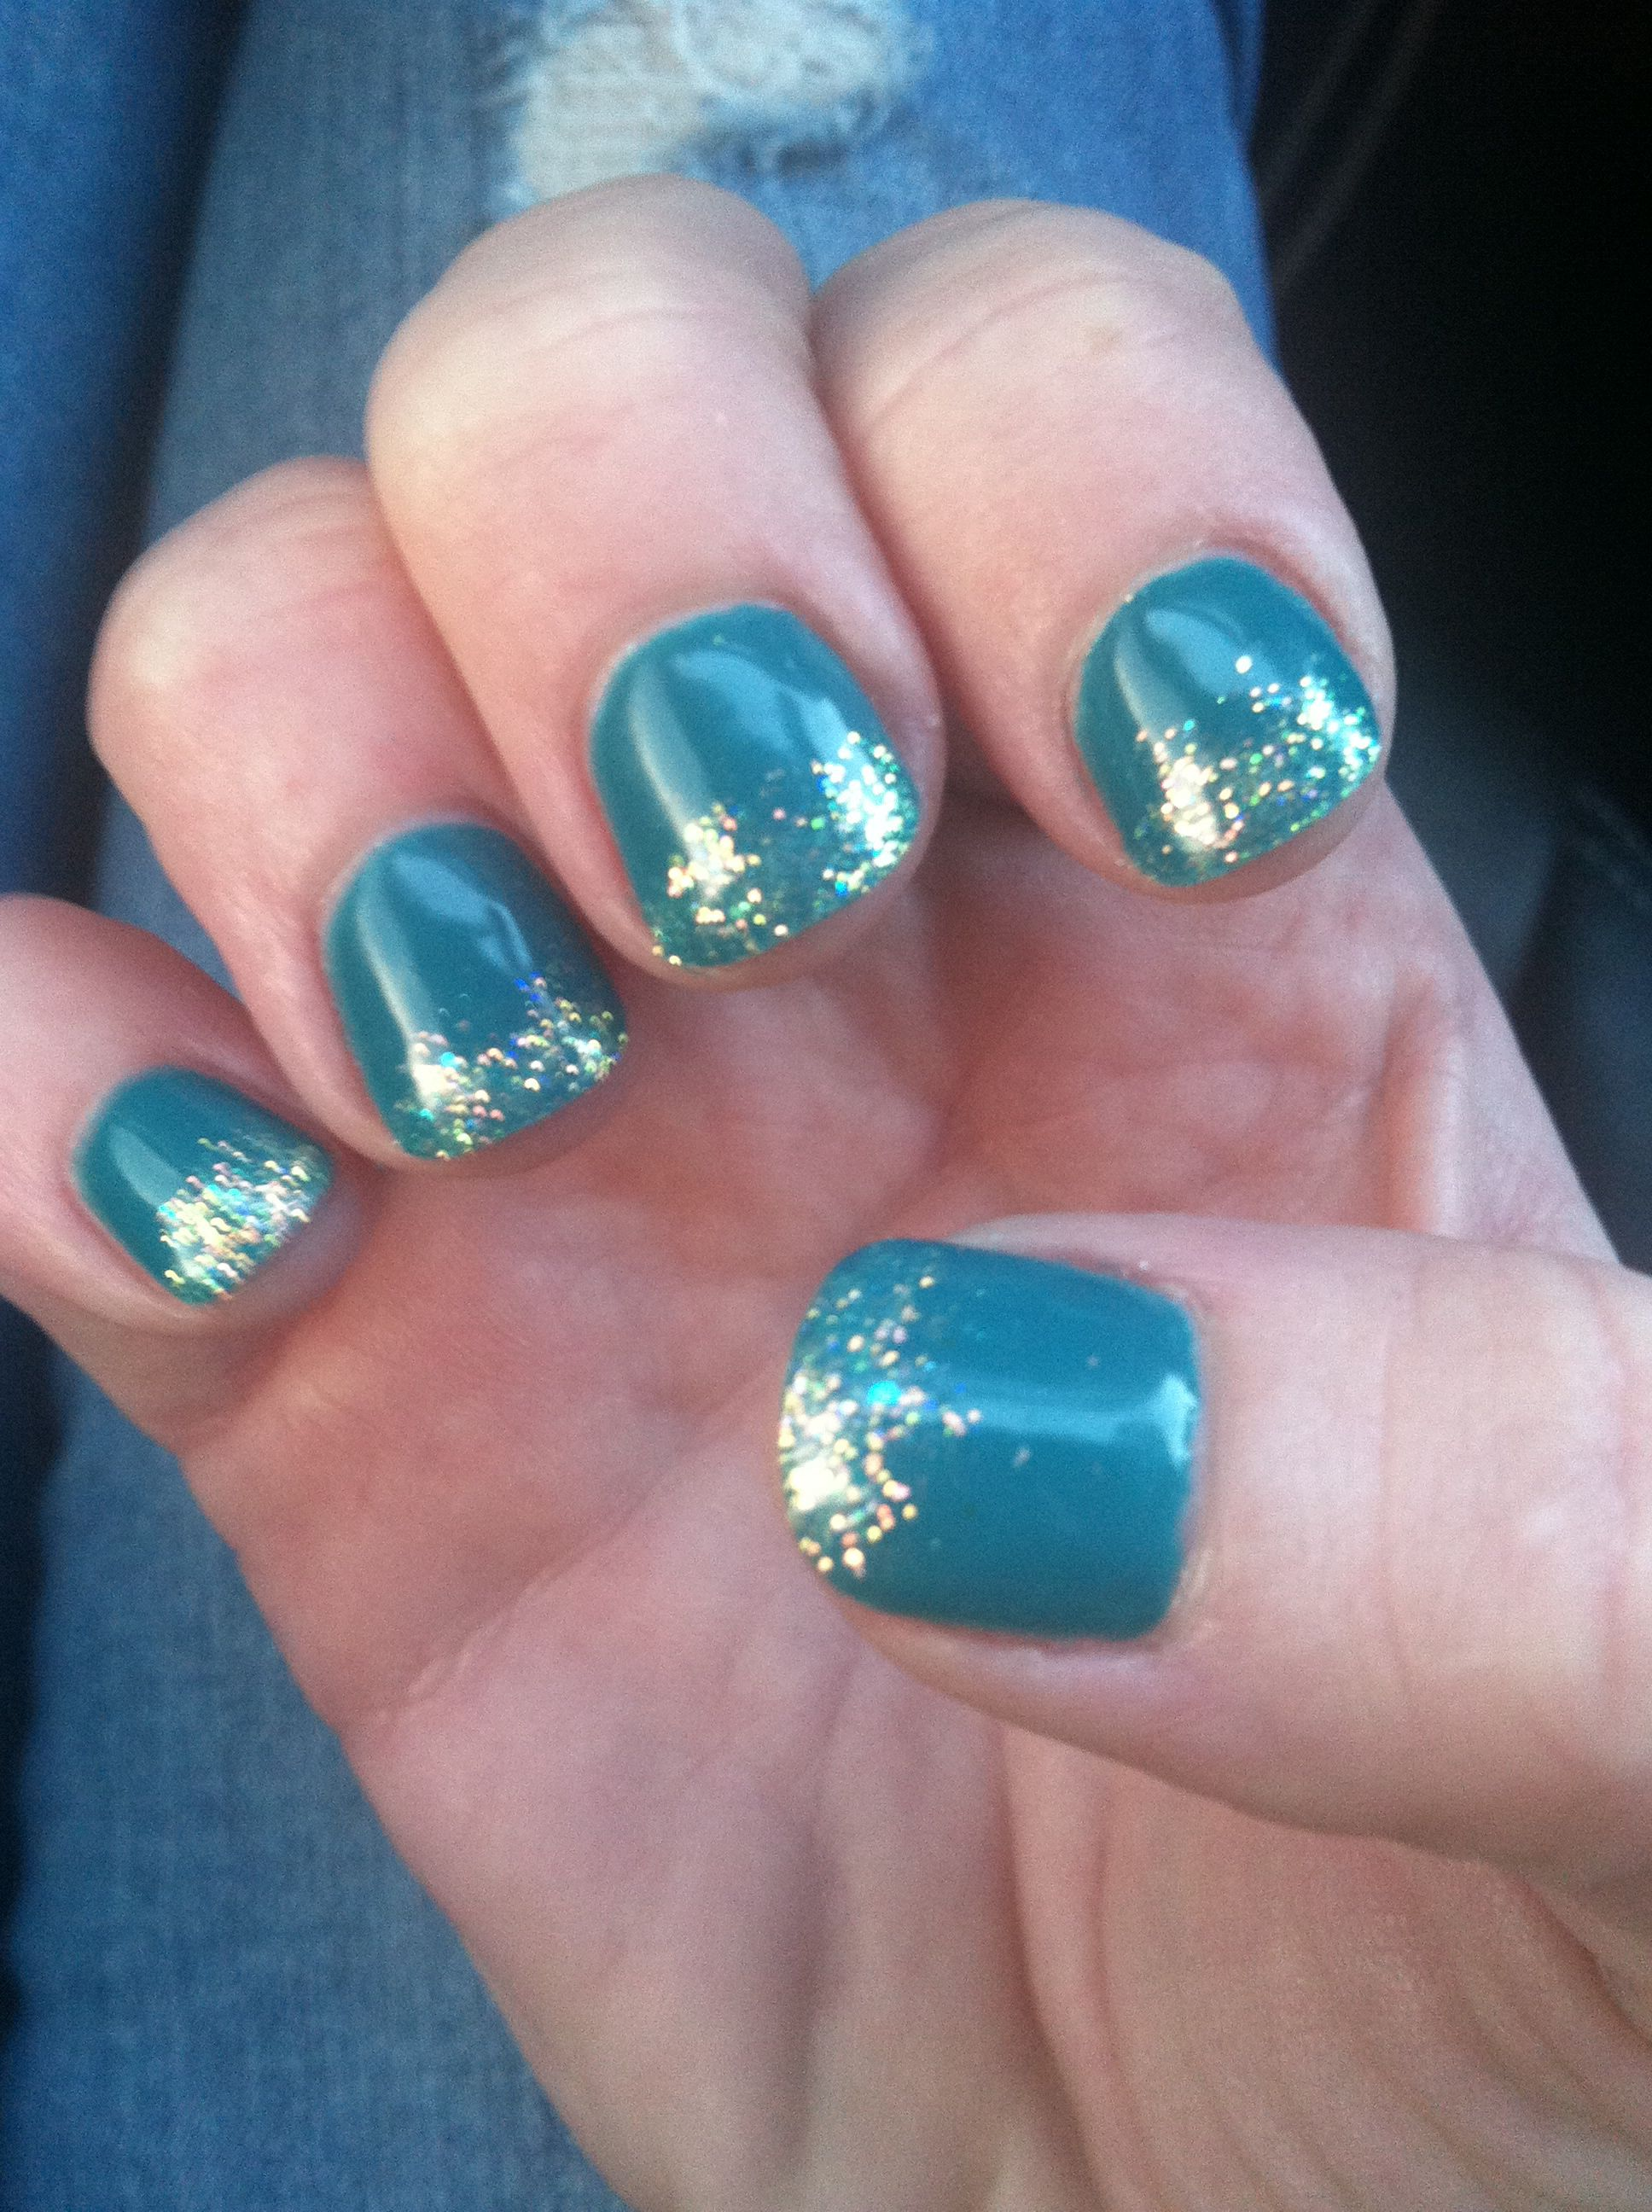 Winter gel nails with shellac polish. | nails | Pinterest